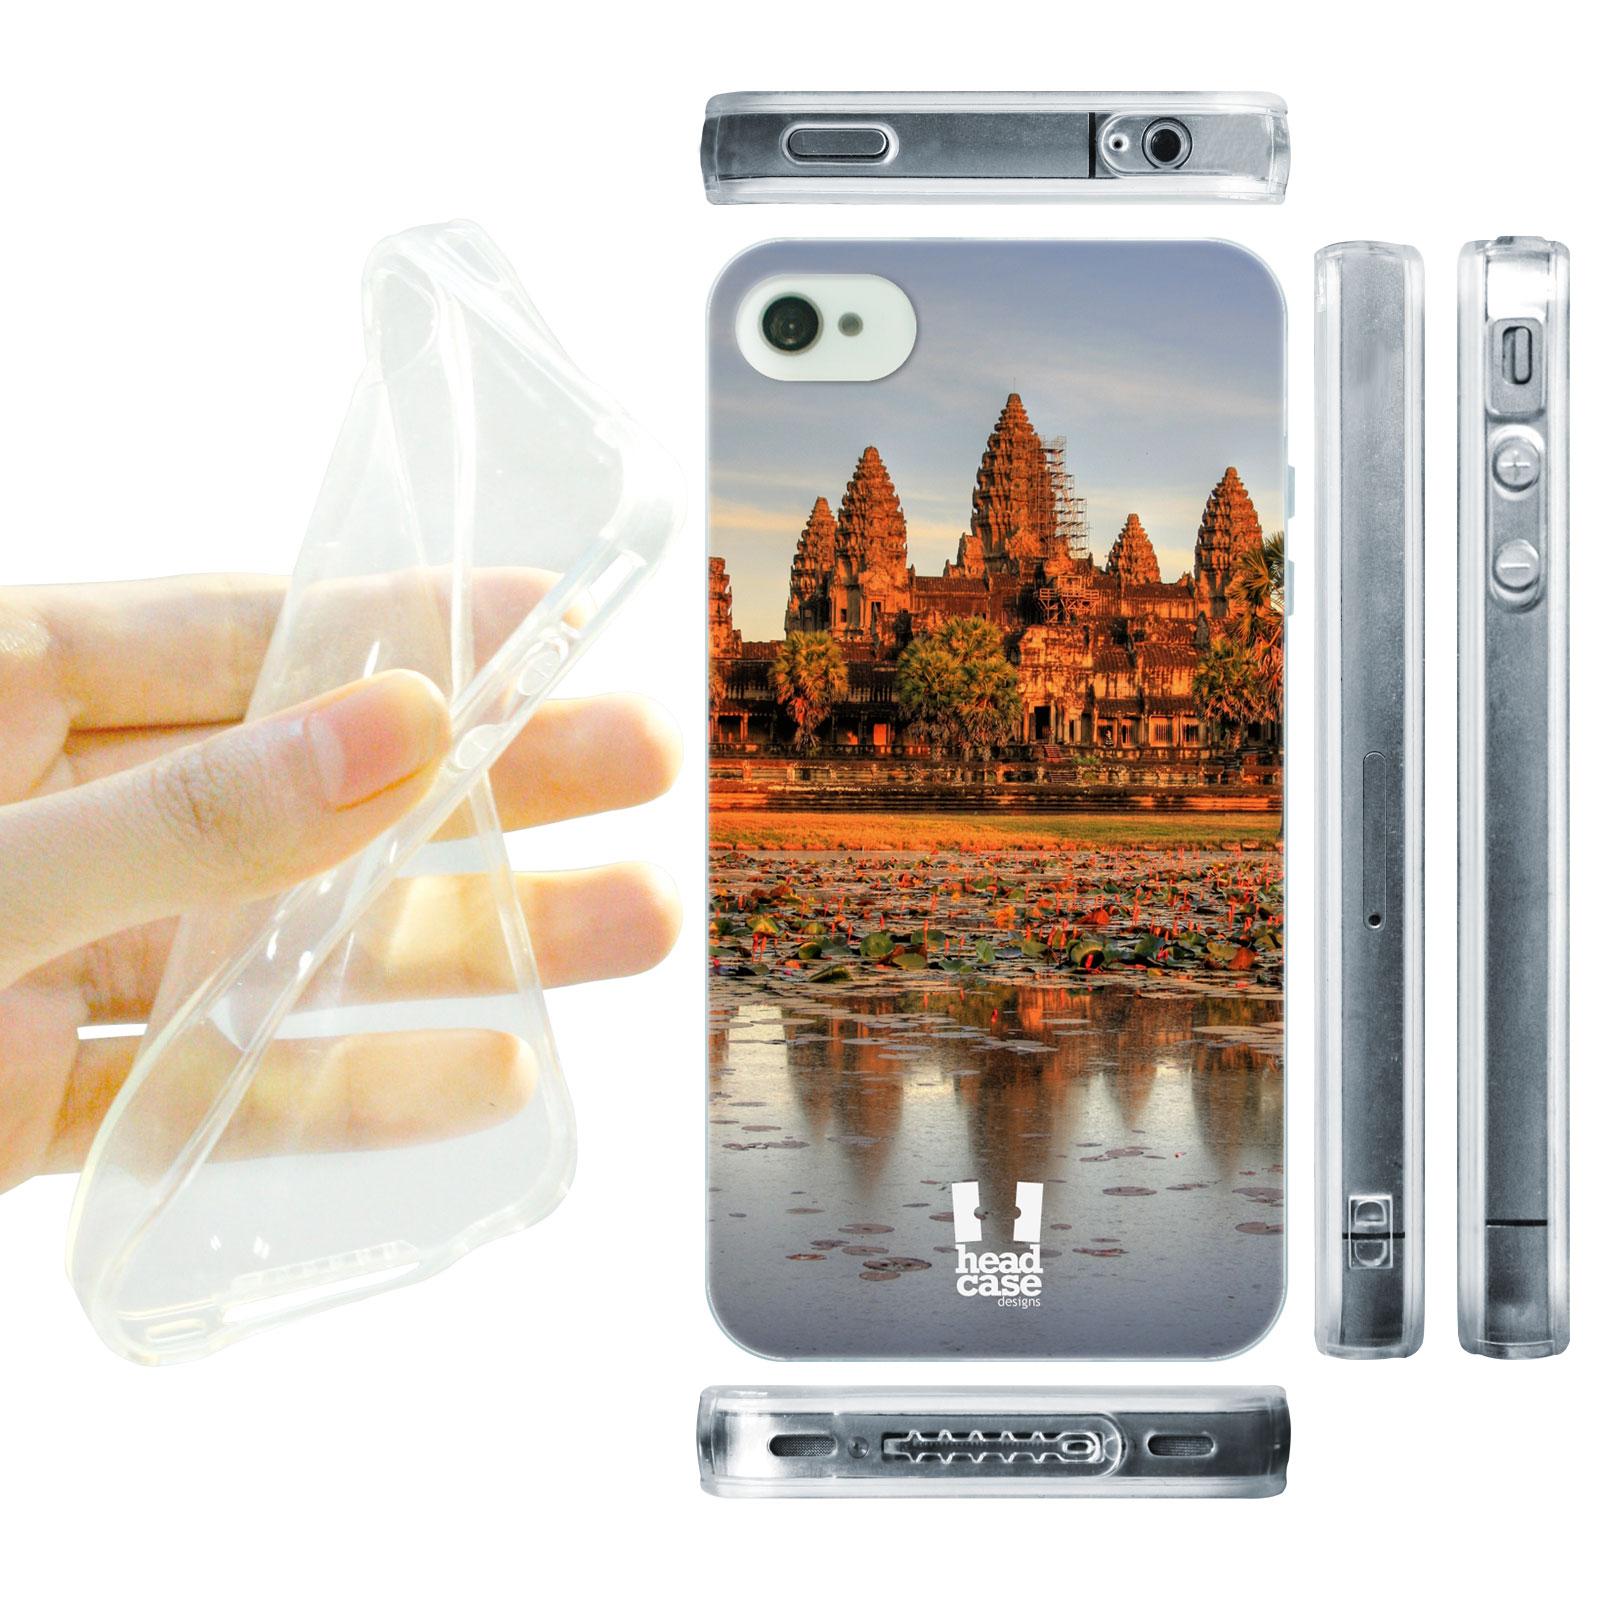 HEAD CASE silikonový obal na mobil Iphone 4/4S foto chrám kambodža